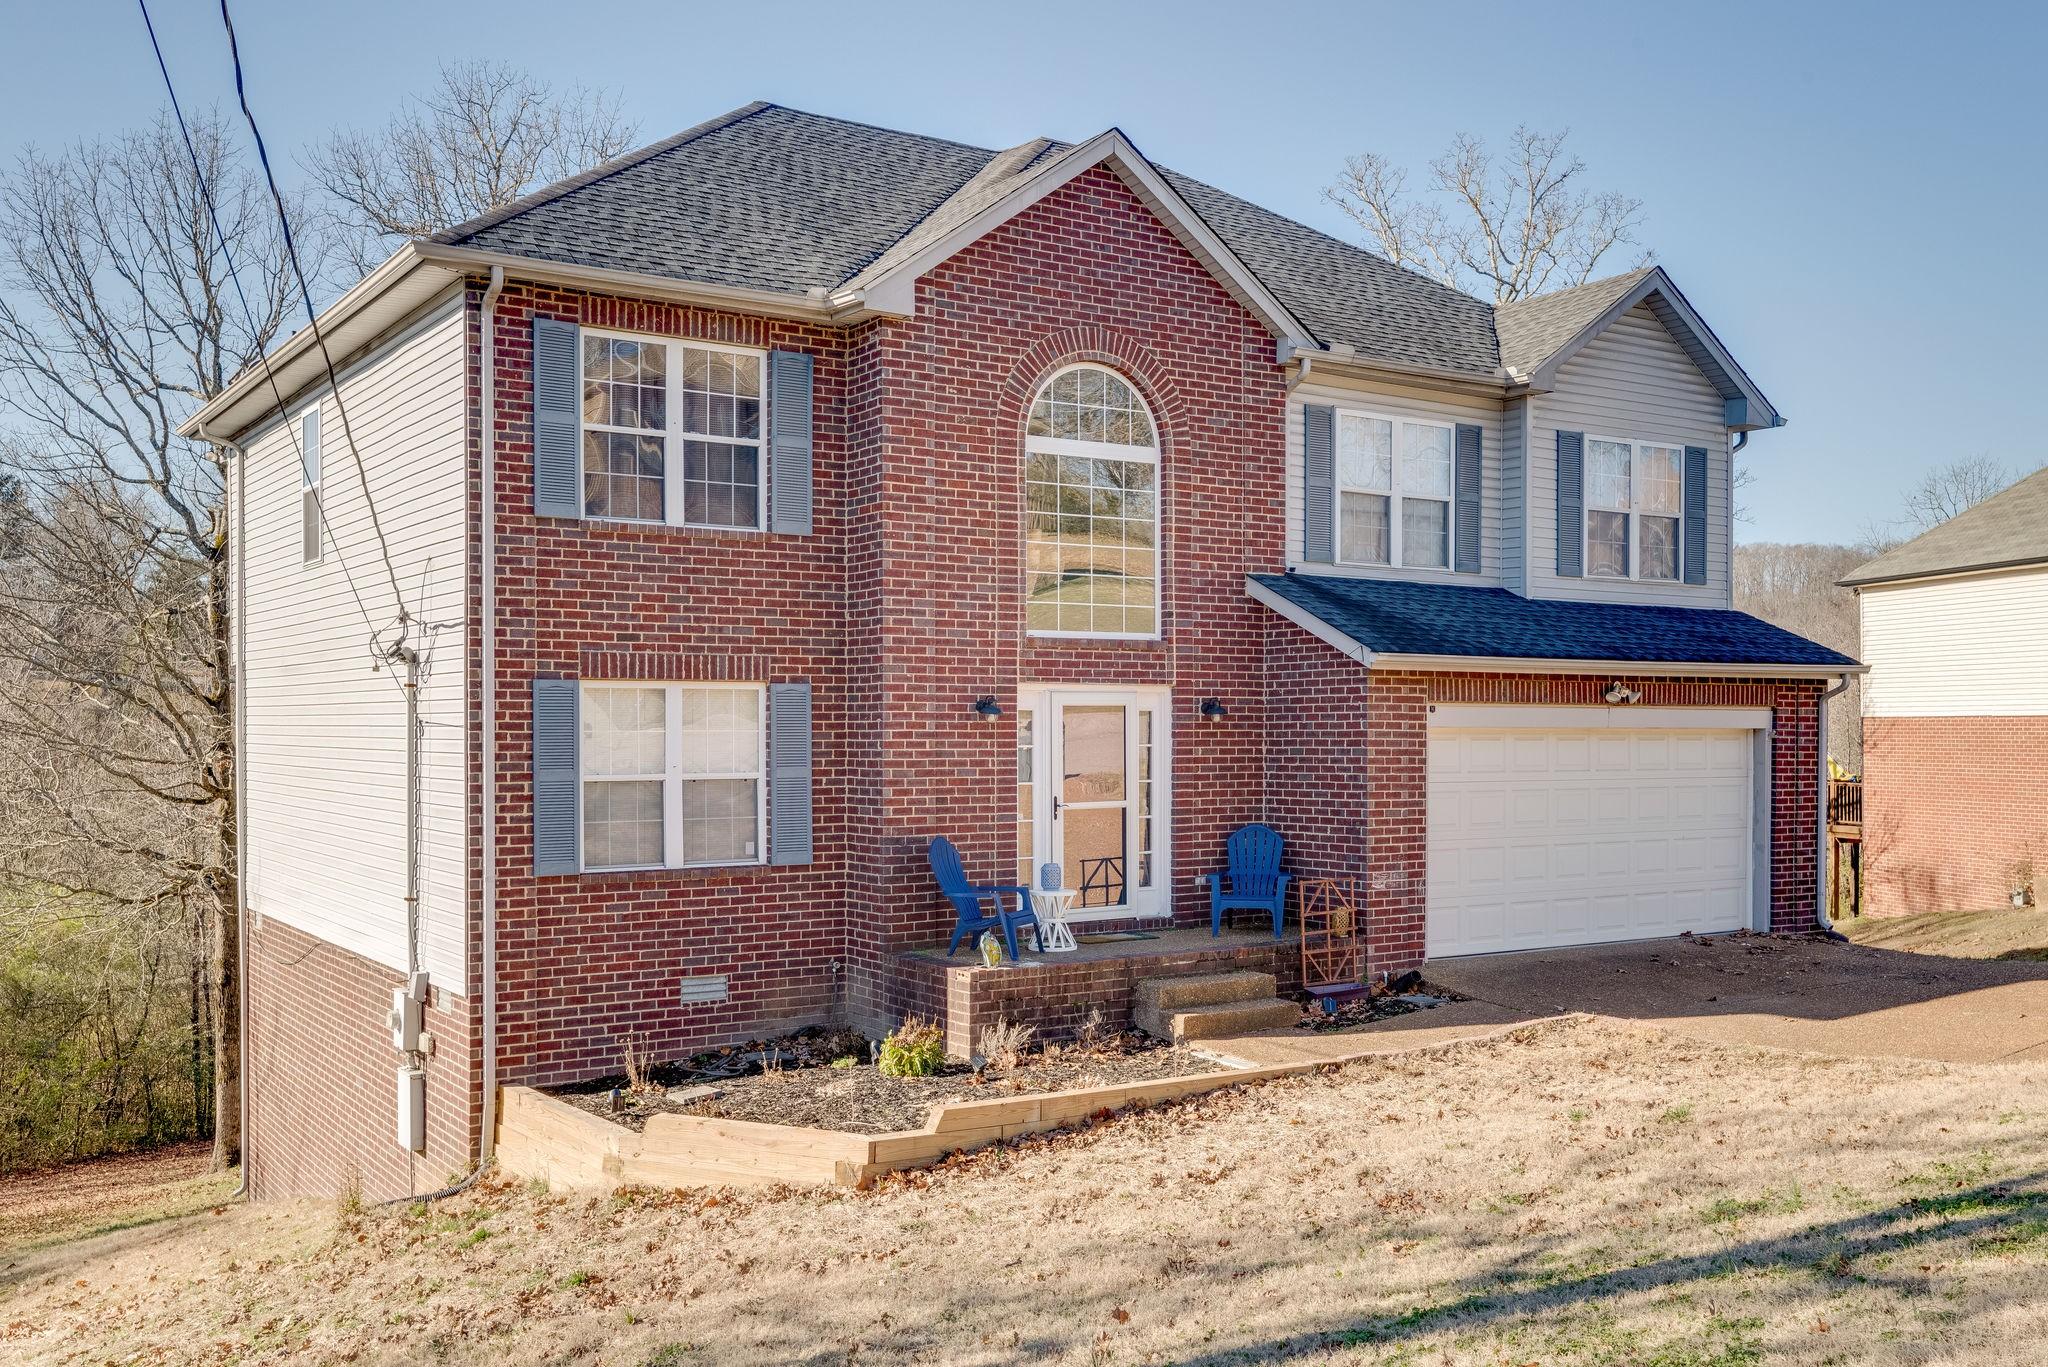 126 Scenic Harpeth Dr, Kingston Springs, TN 37082 - Kingston Springs, TN real estate listing